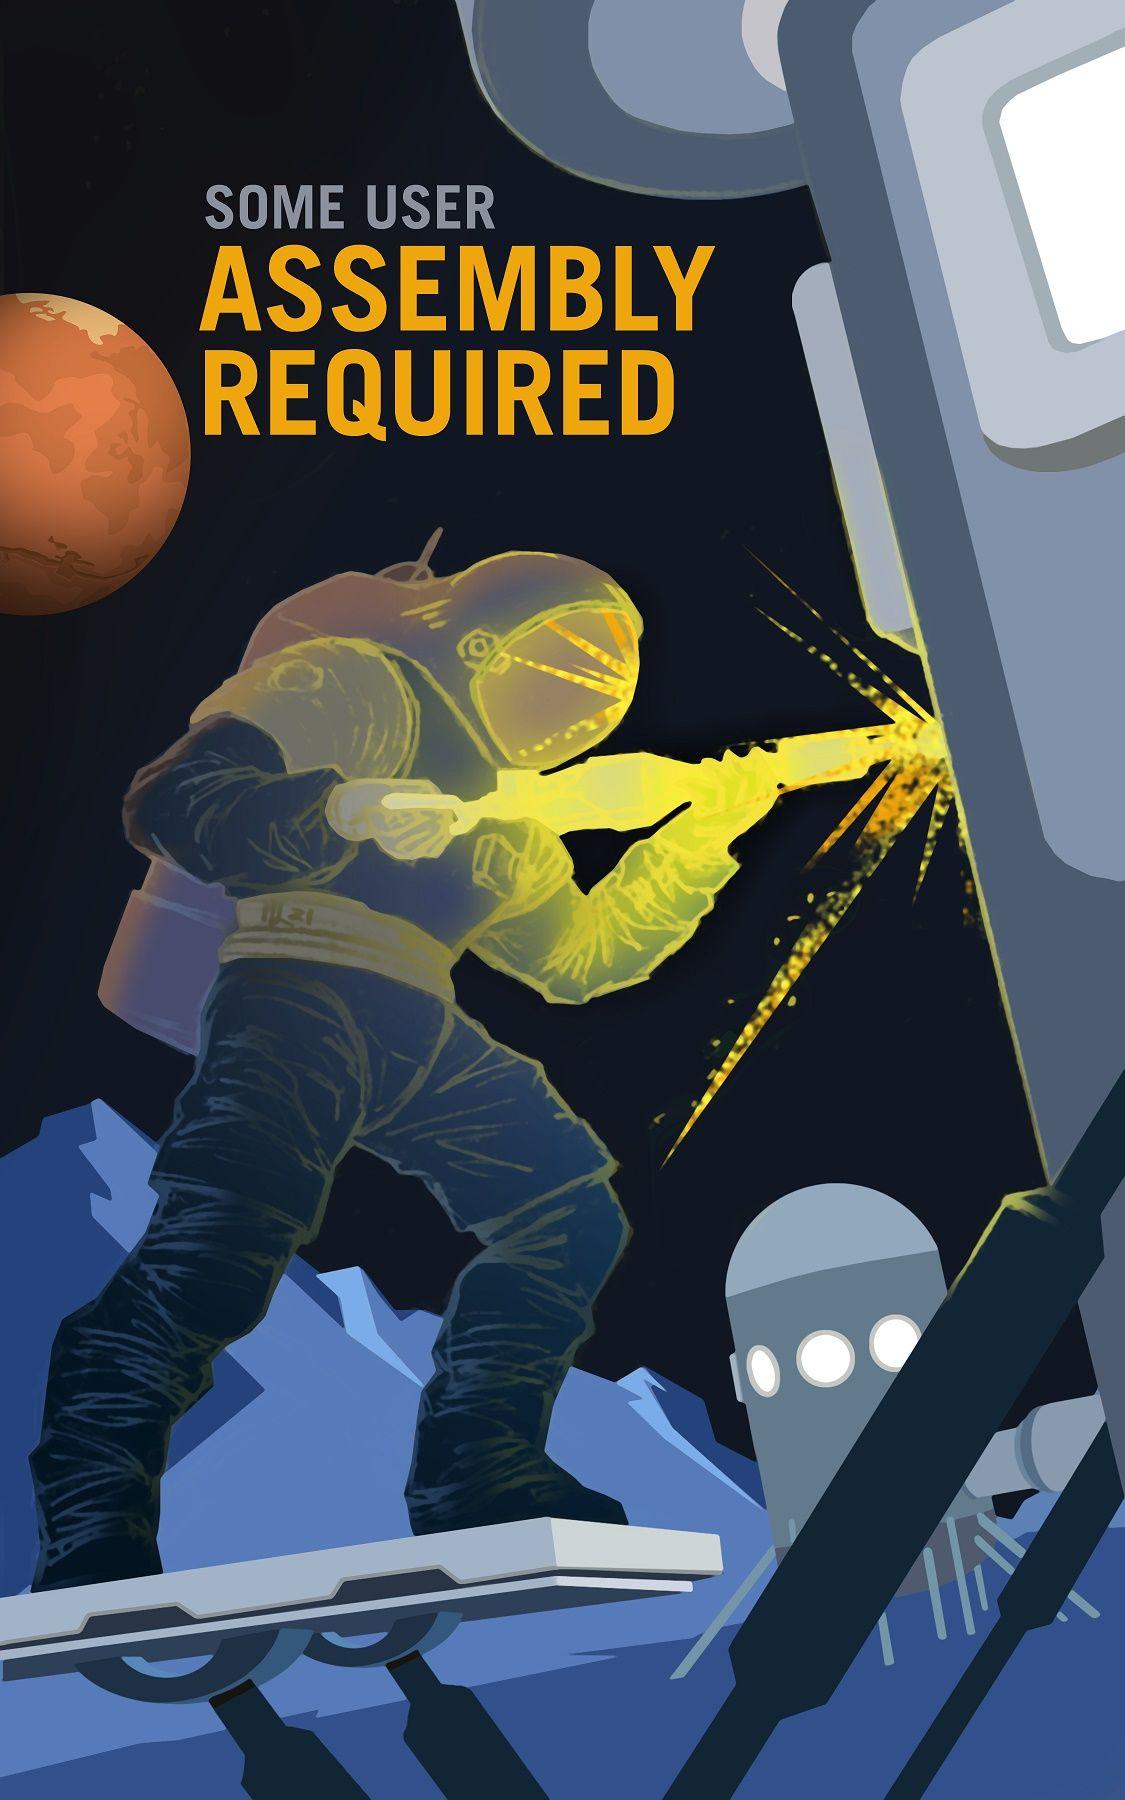 MARS NASA RECRUITMENT POSTER